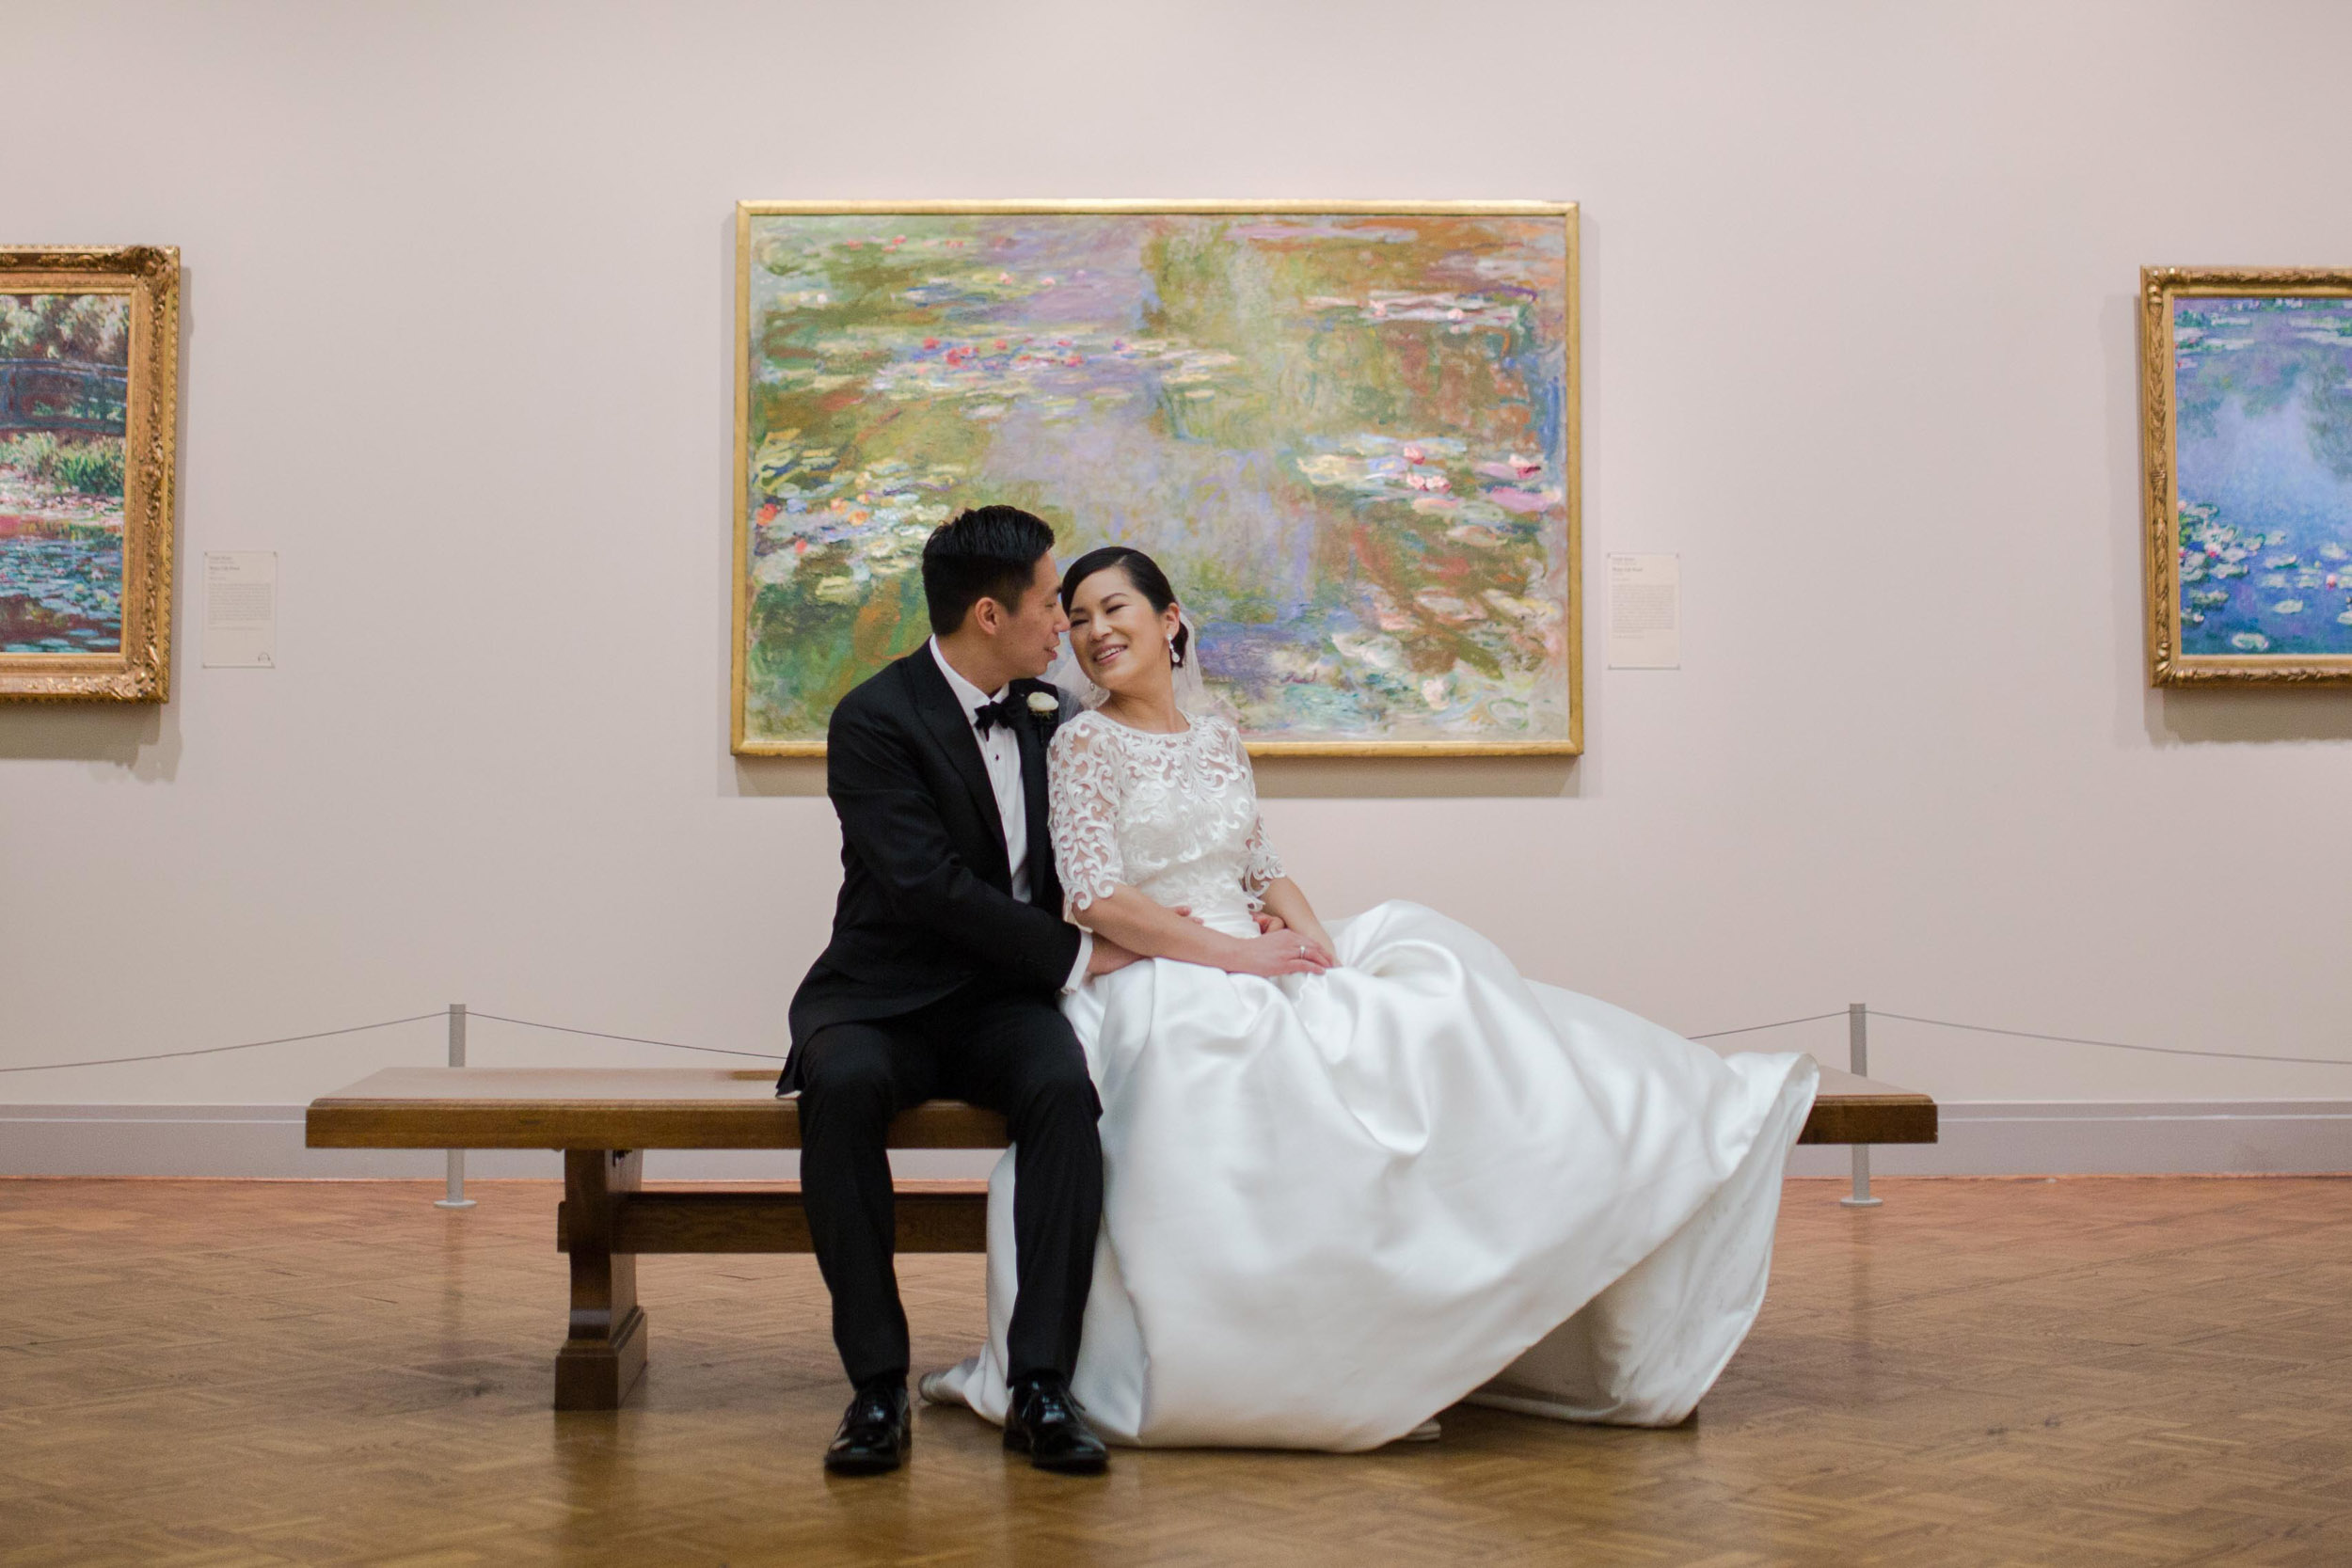 Art Institute Chicago wedding photography